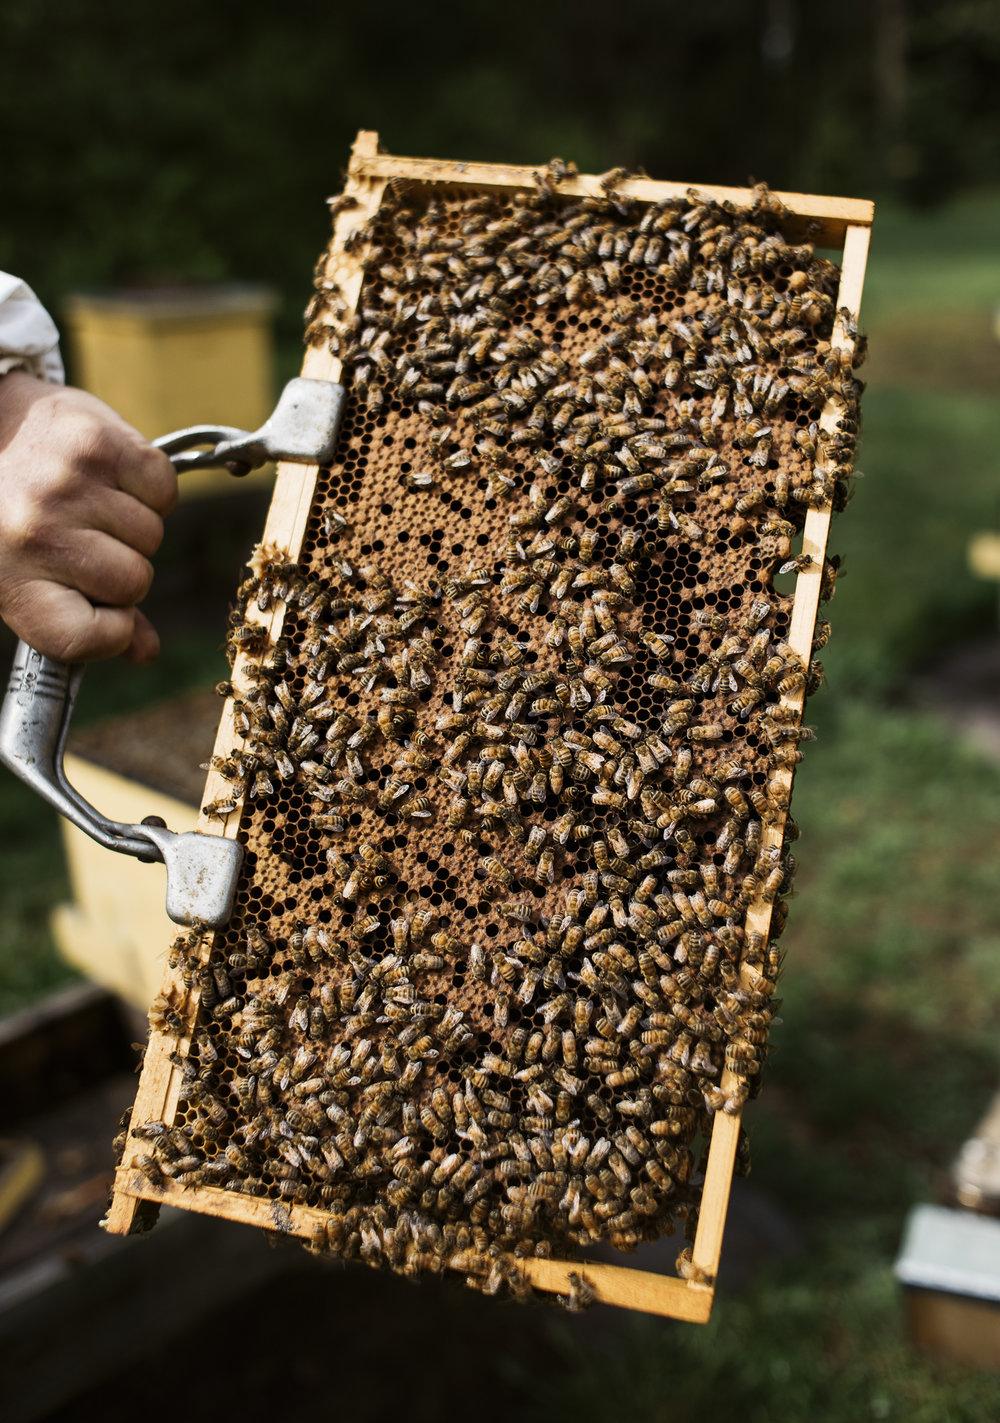 Center for Honeybee Research